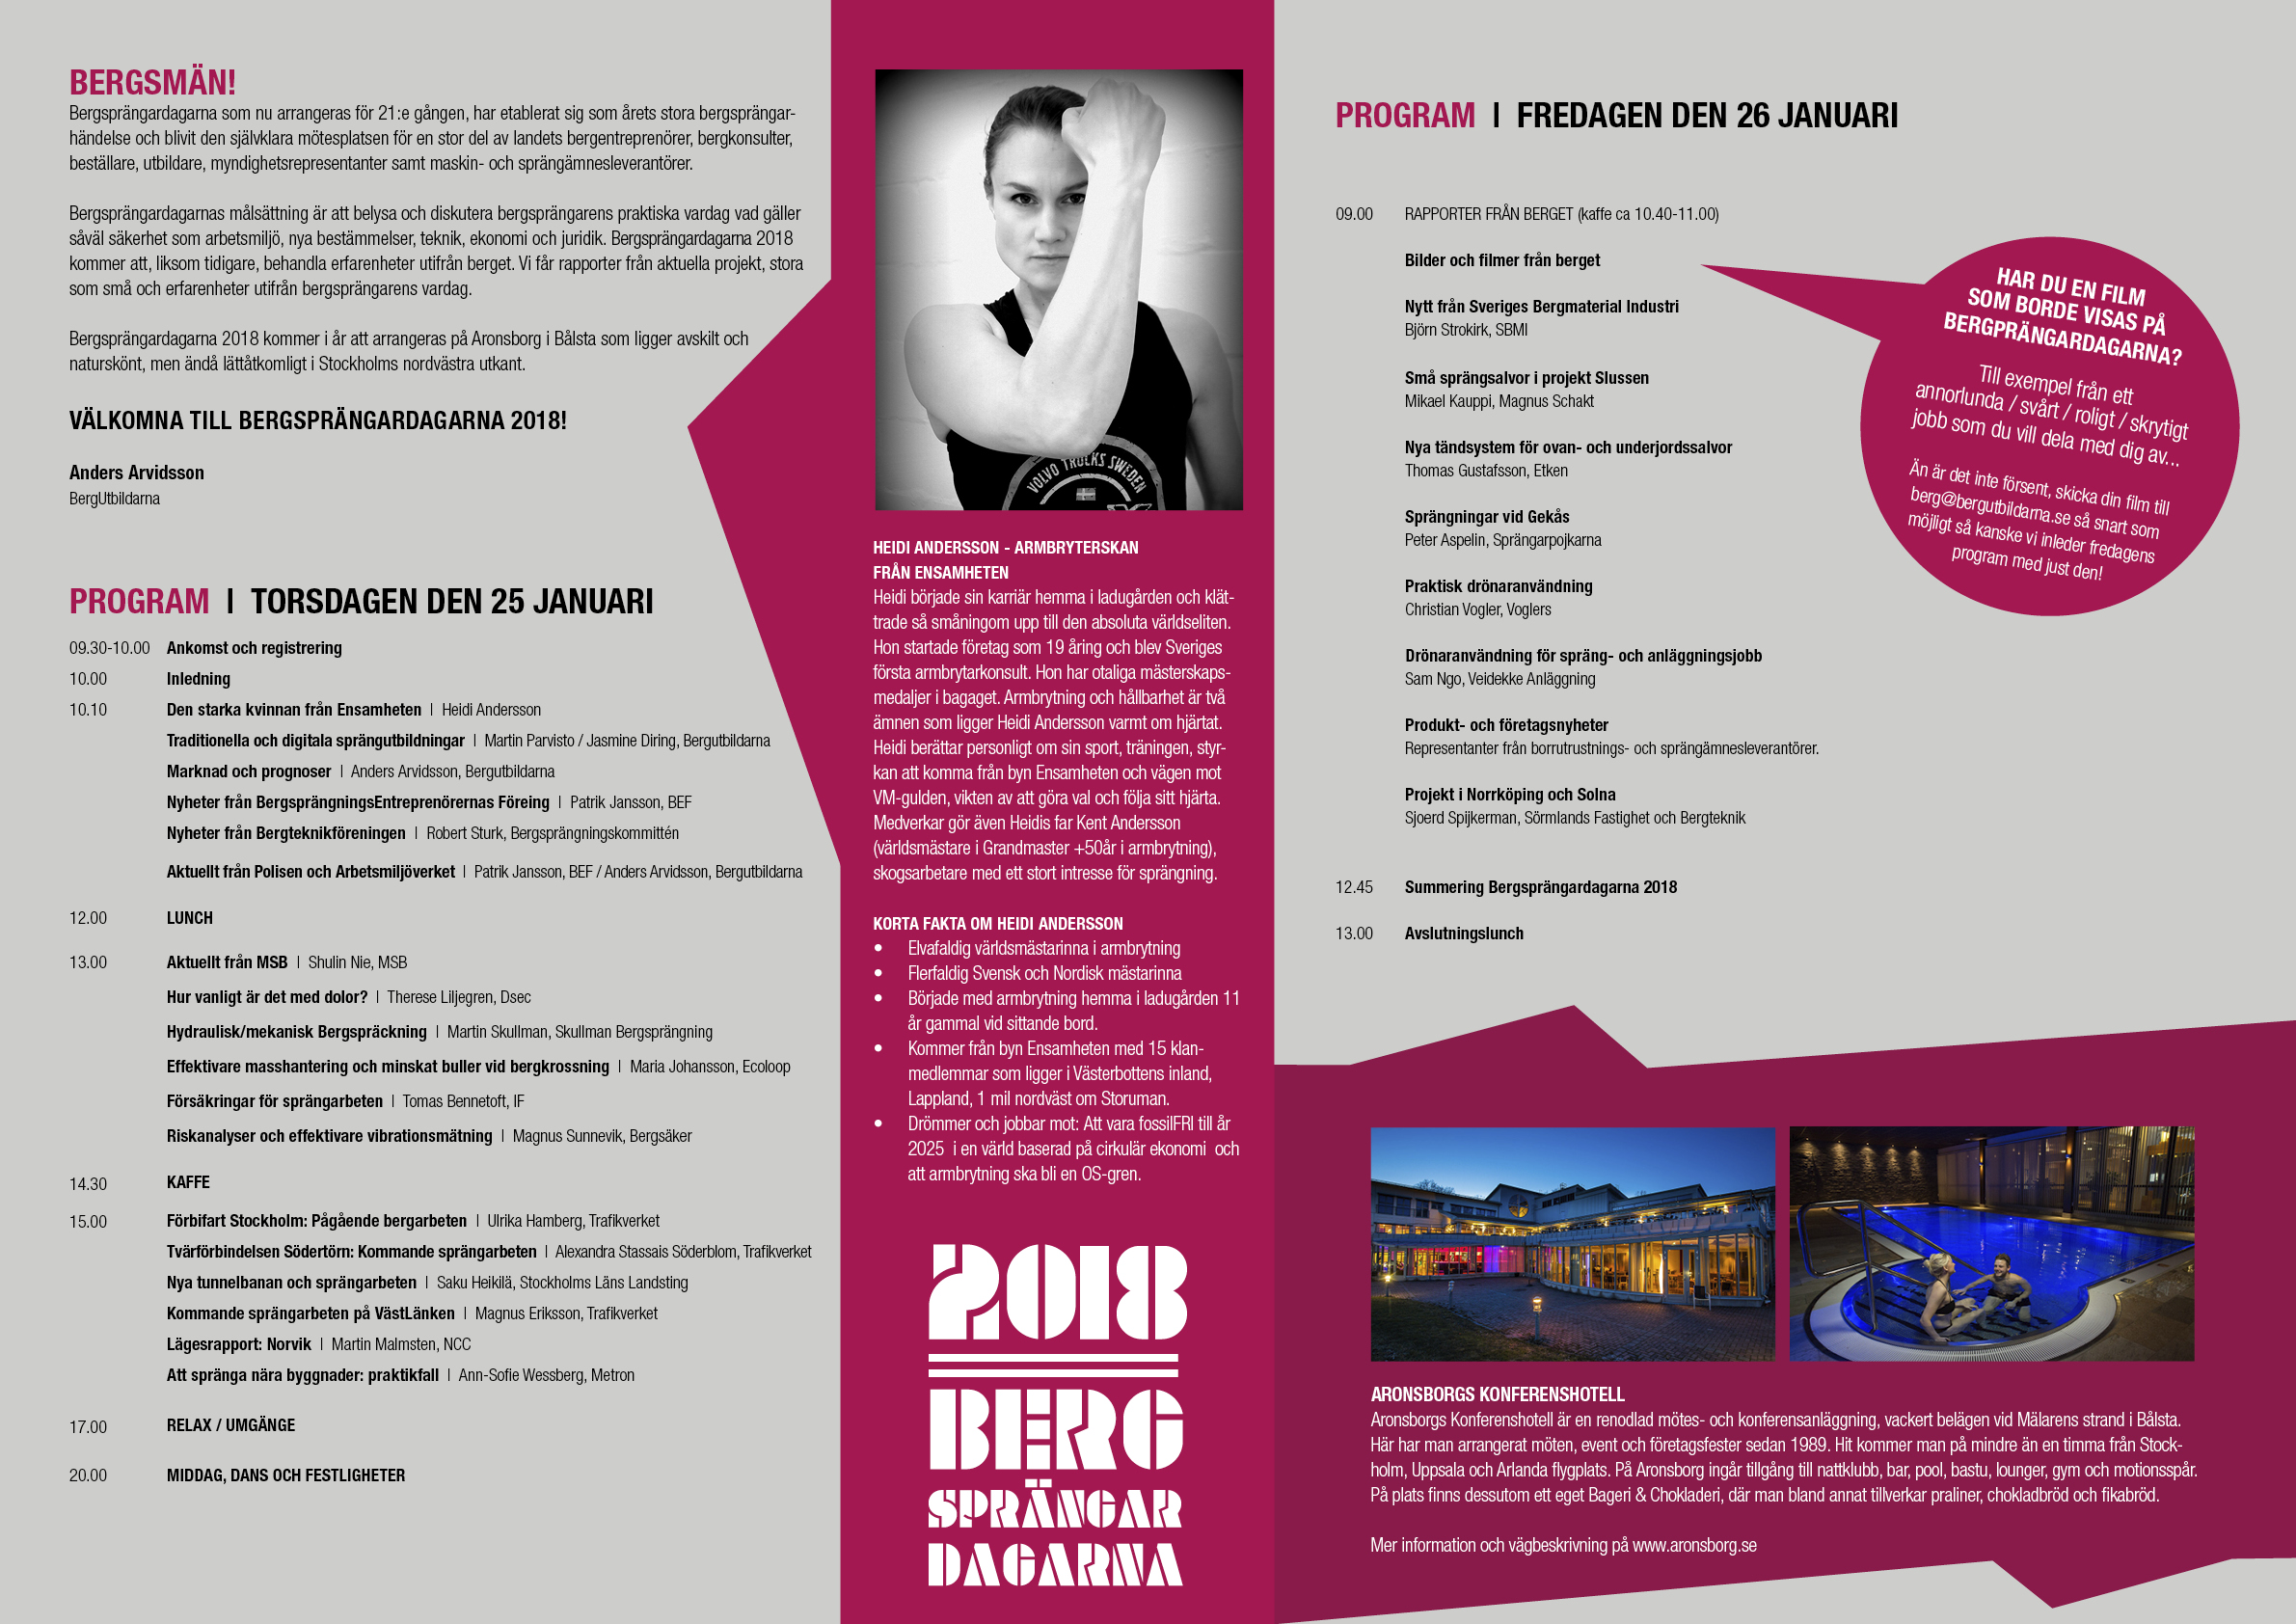 Bergsprangardagarna_2018_program_webV42